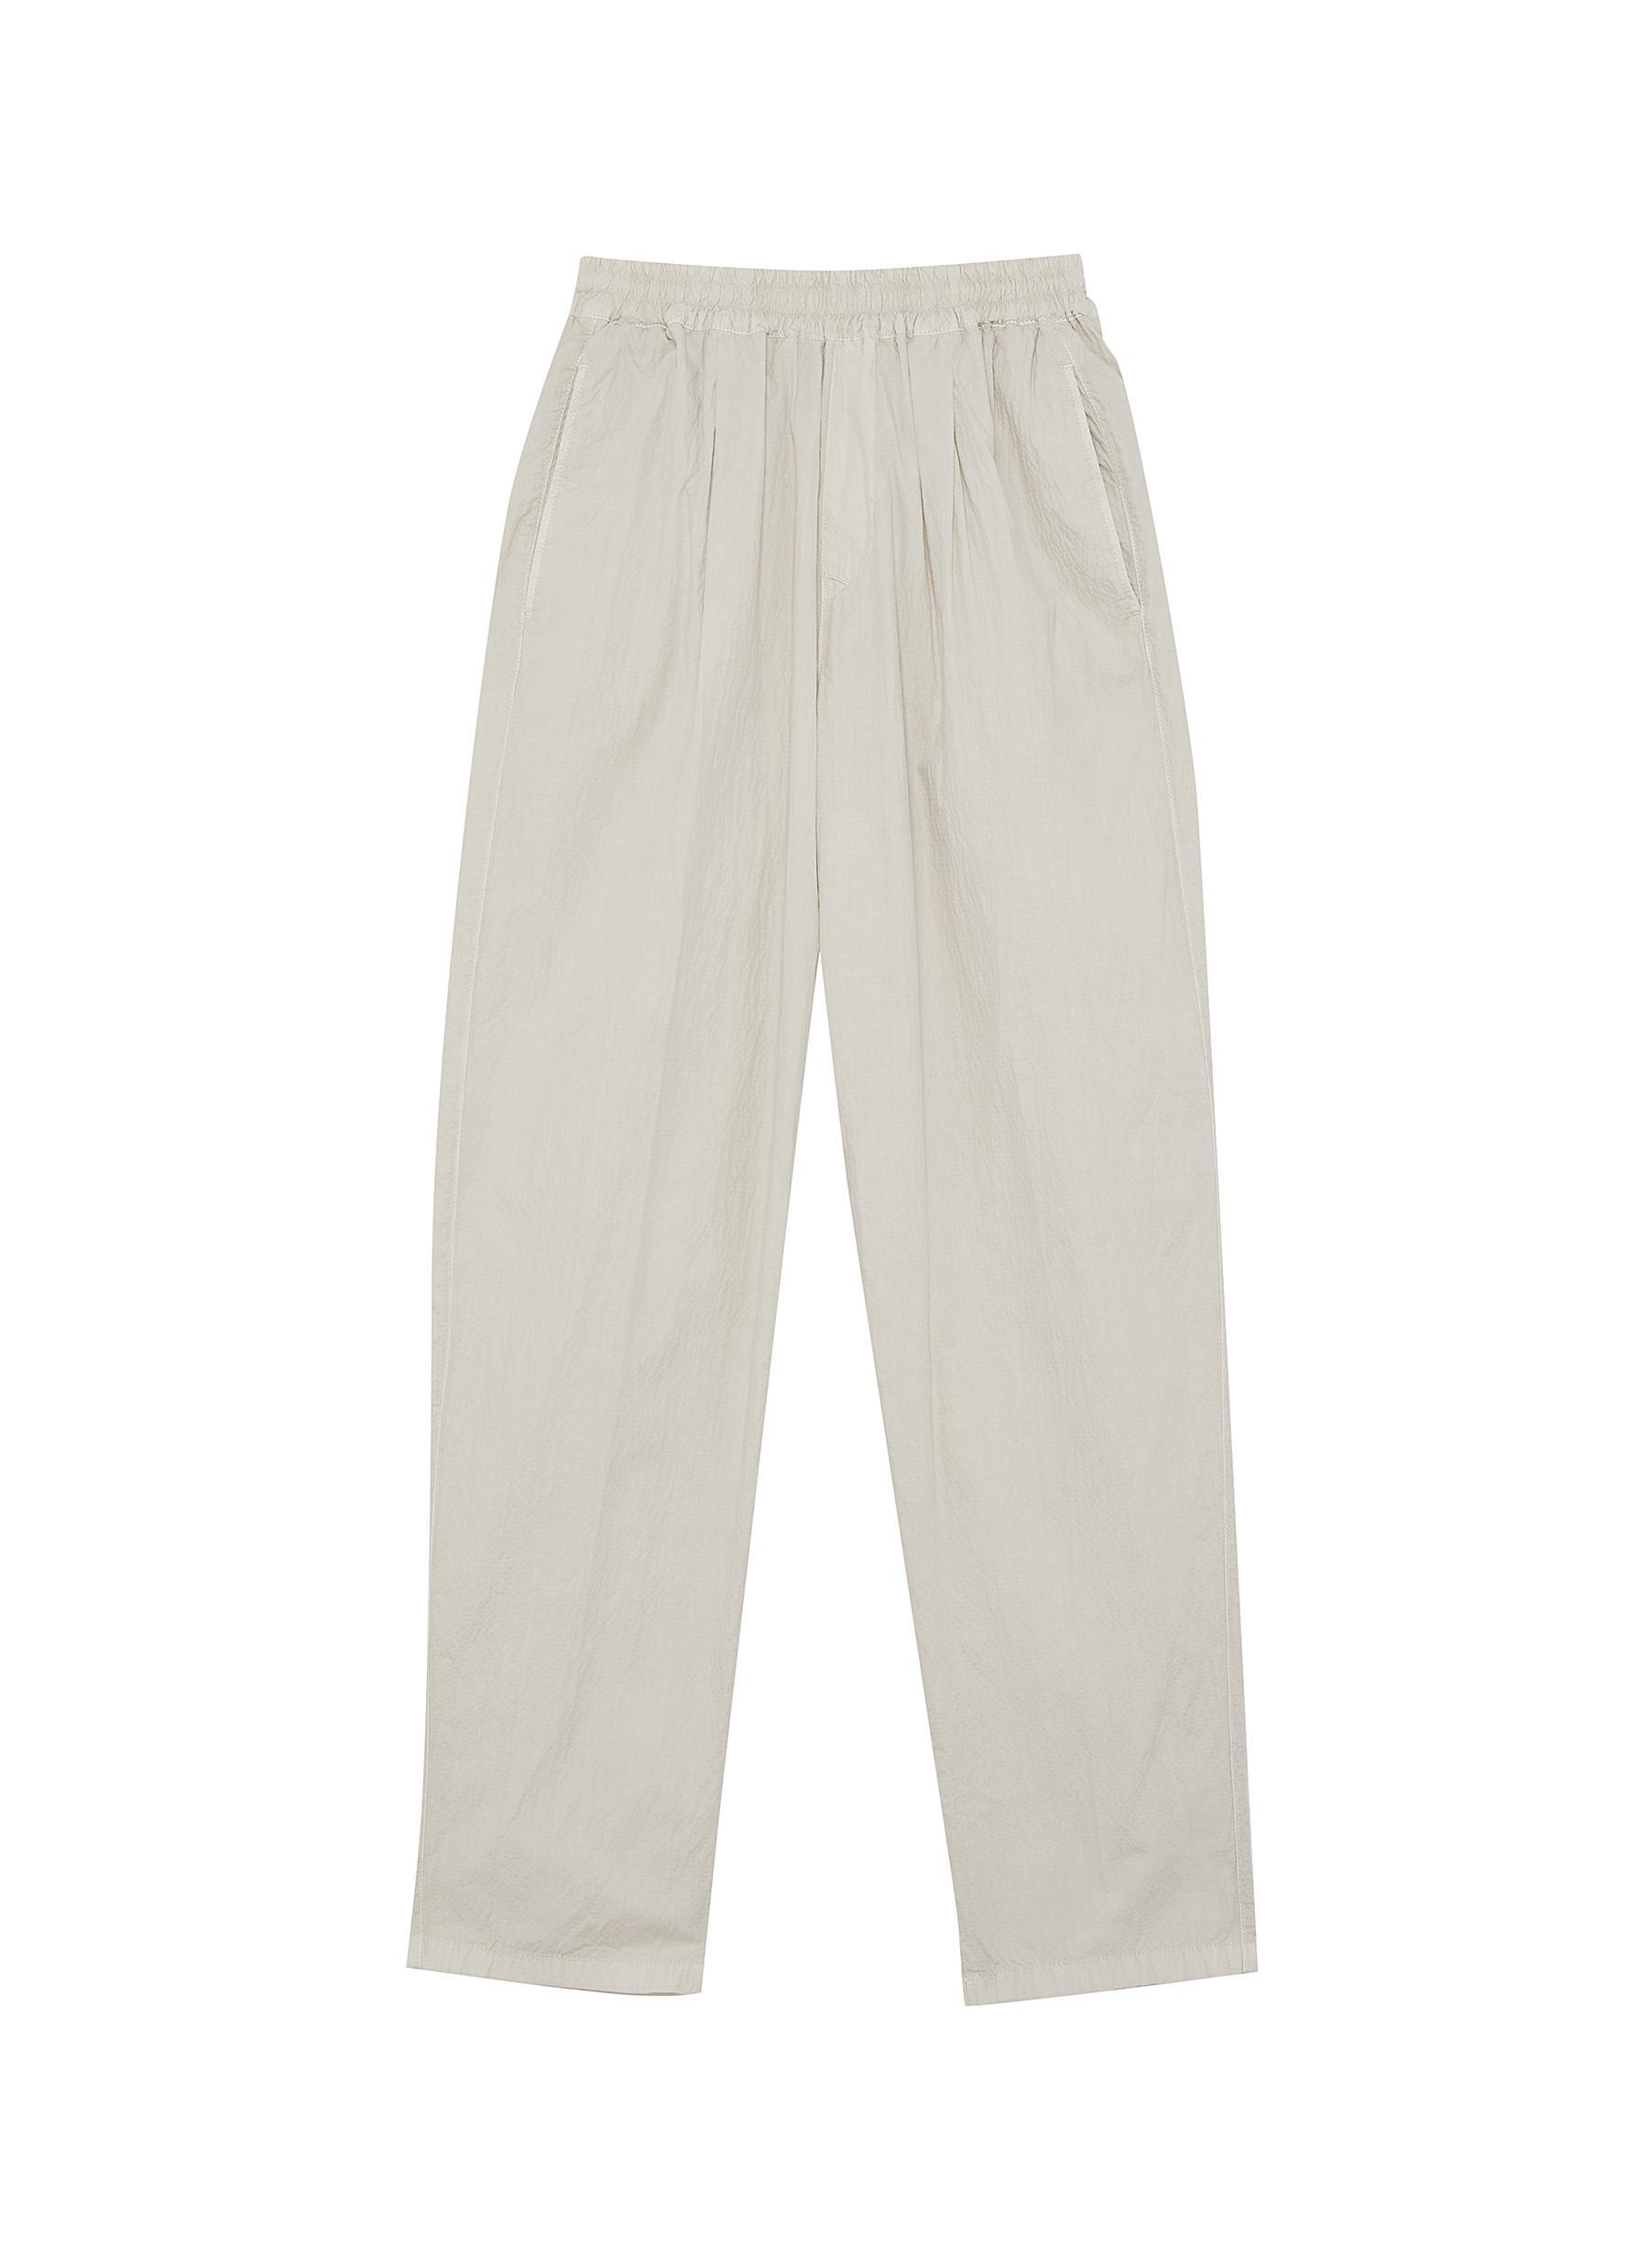 Garment Dyed Pants - THE GIGI - Modalova